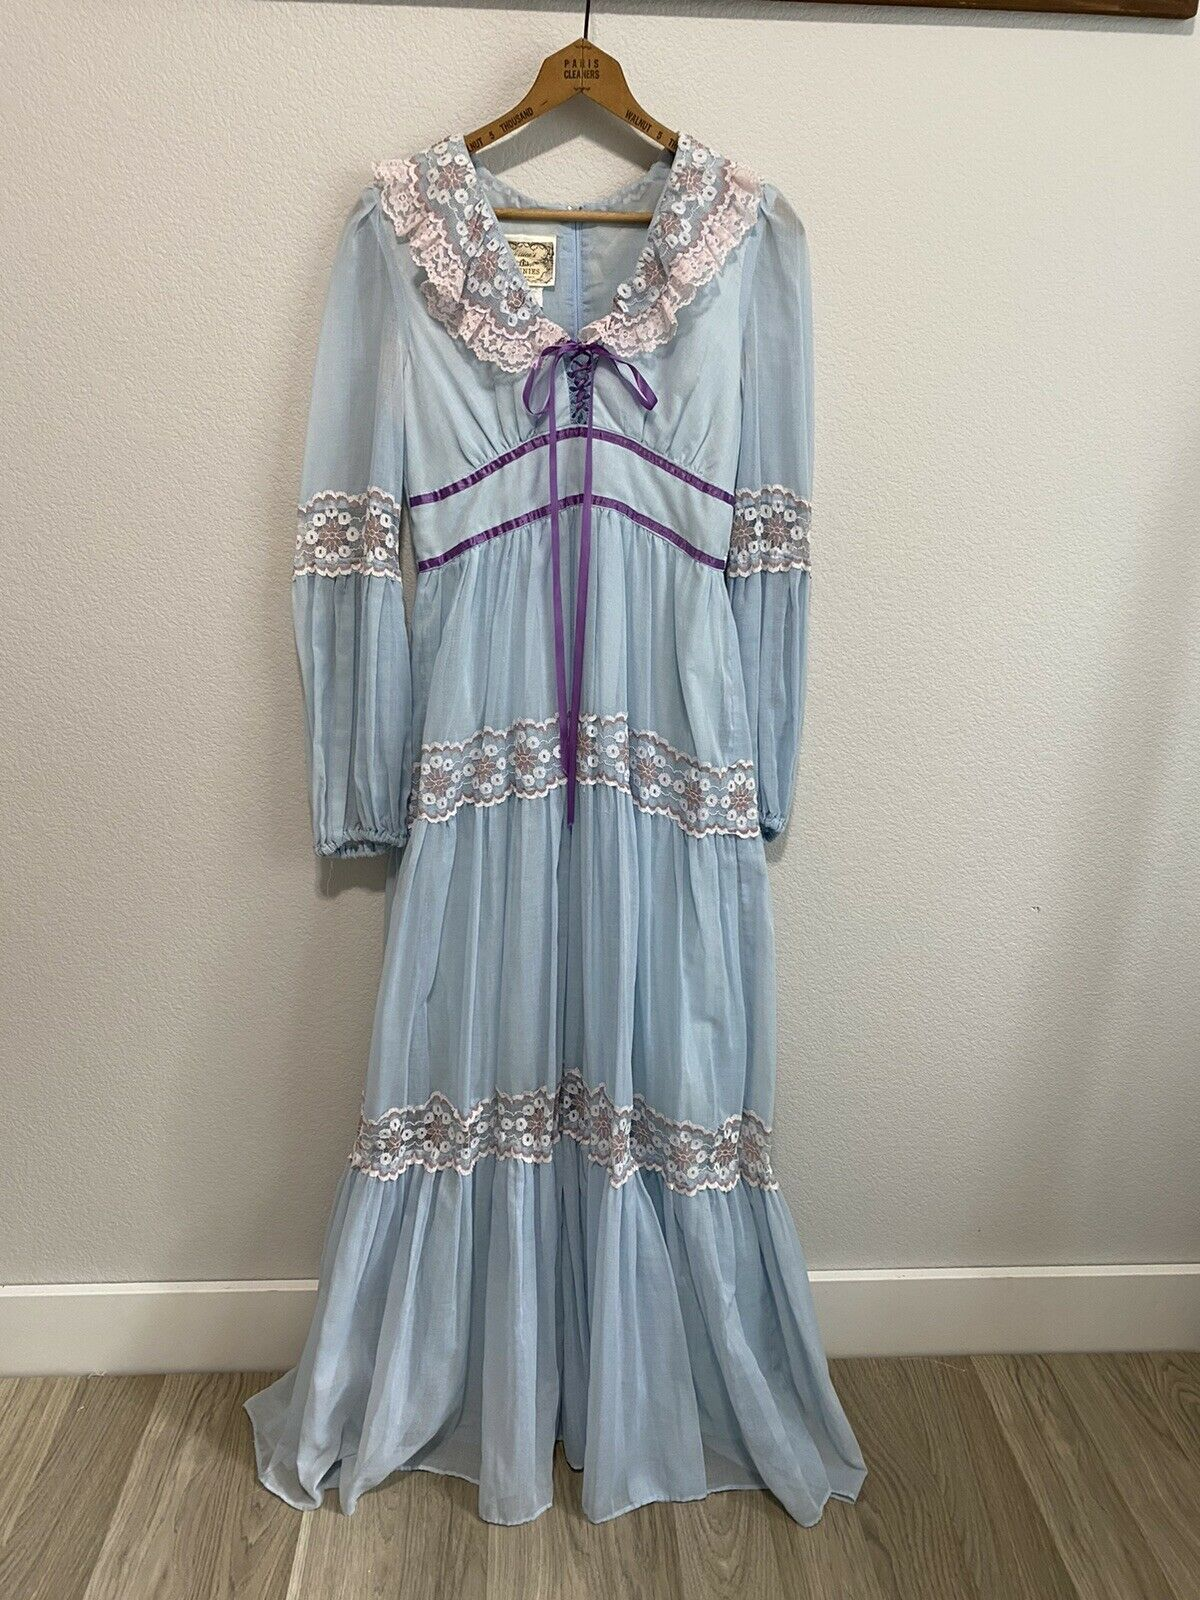 Vintage Gunne Sax Cottagecore Dress Size 11 - image 1